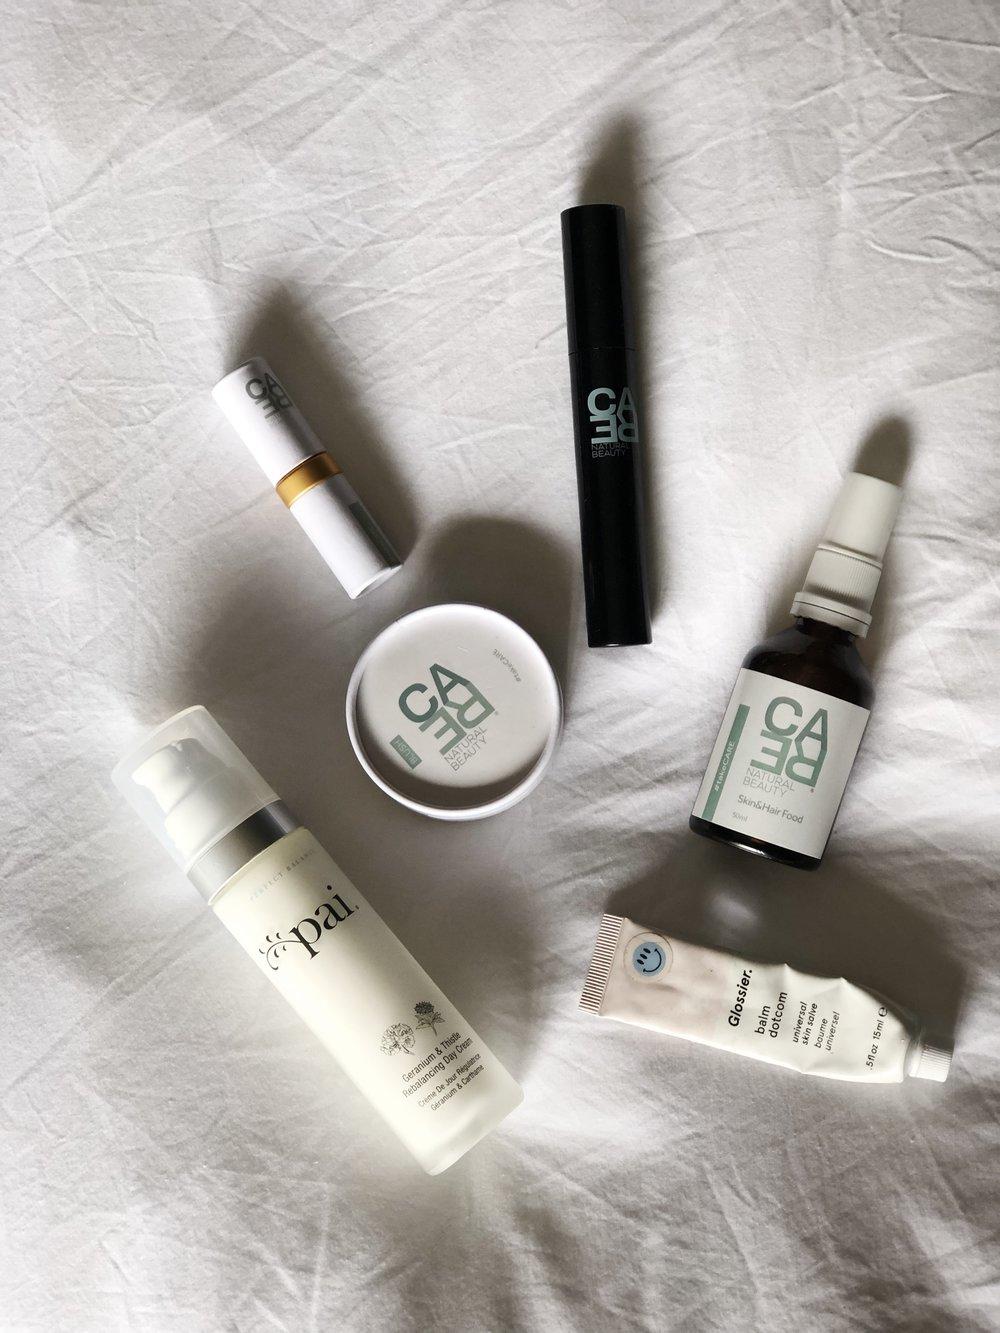 Hidratante Pai / Blush, batom, máscara de cílios, água thermal Care Natural Beauty / Gloss Glossier